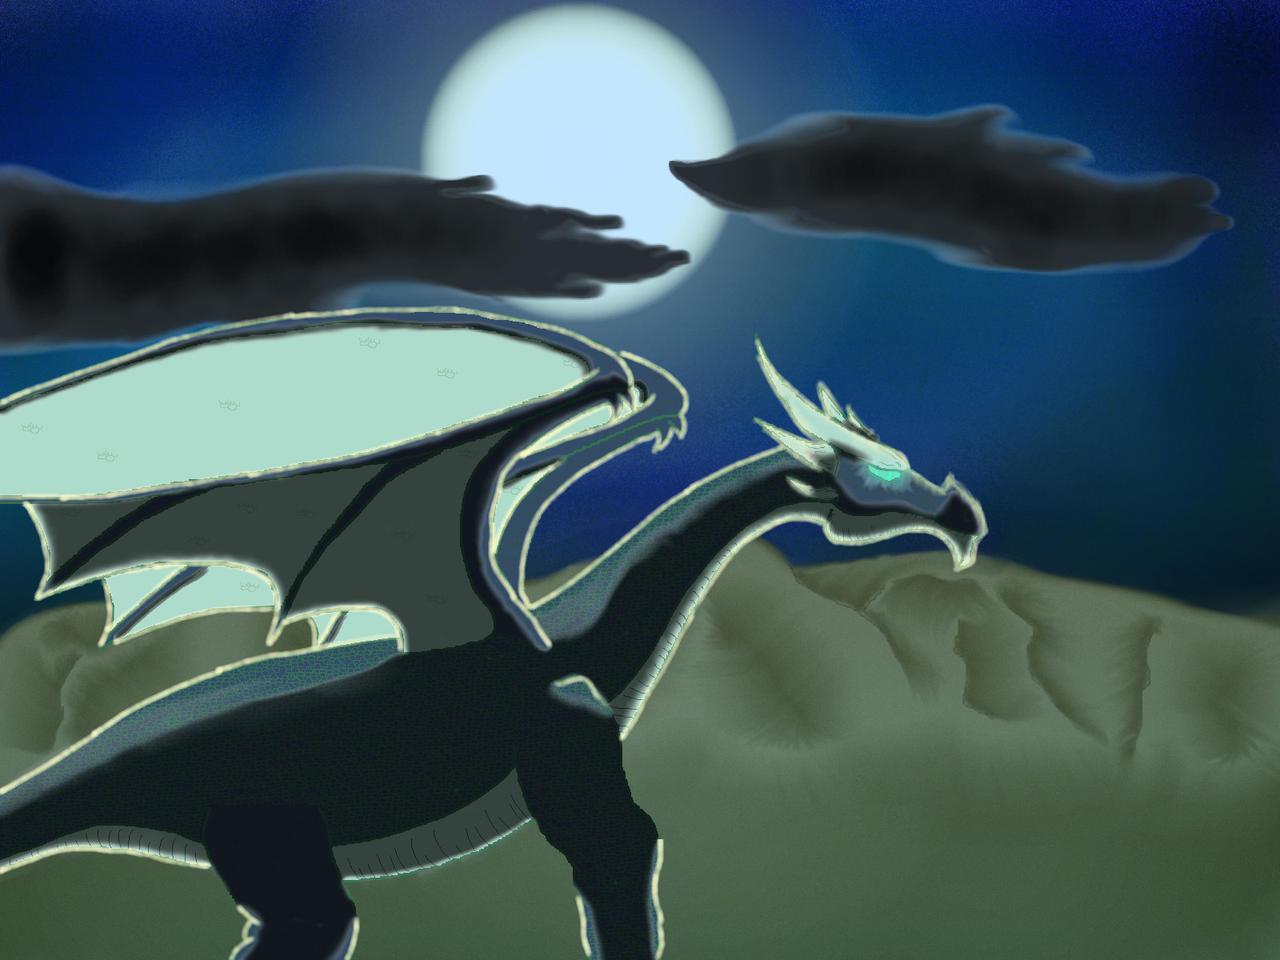 Beneath the Moonlight by Daratrix